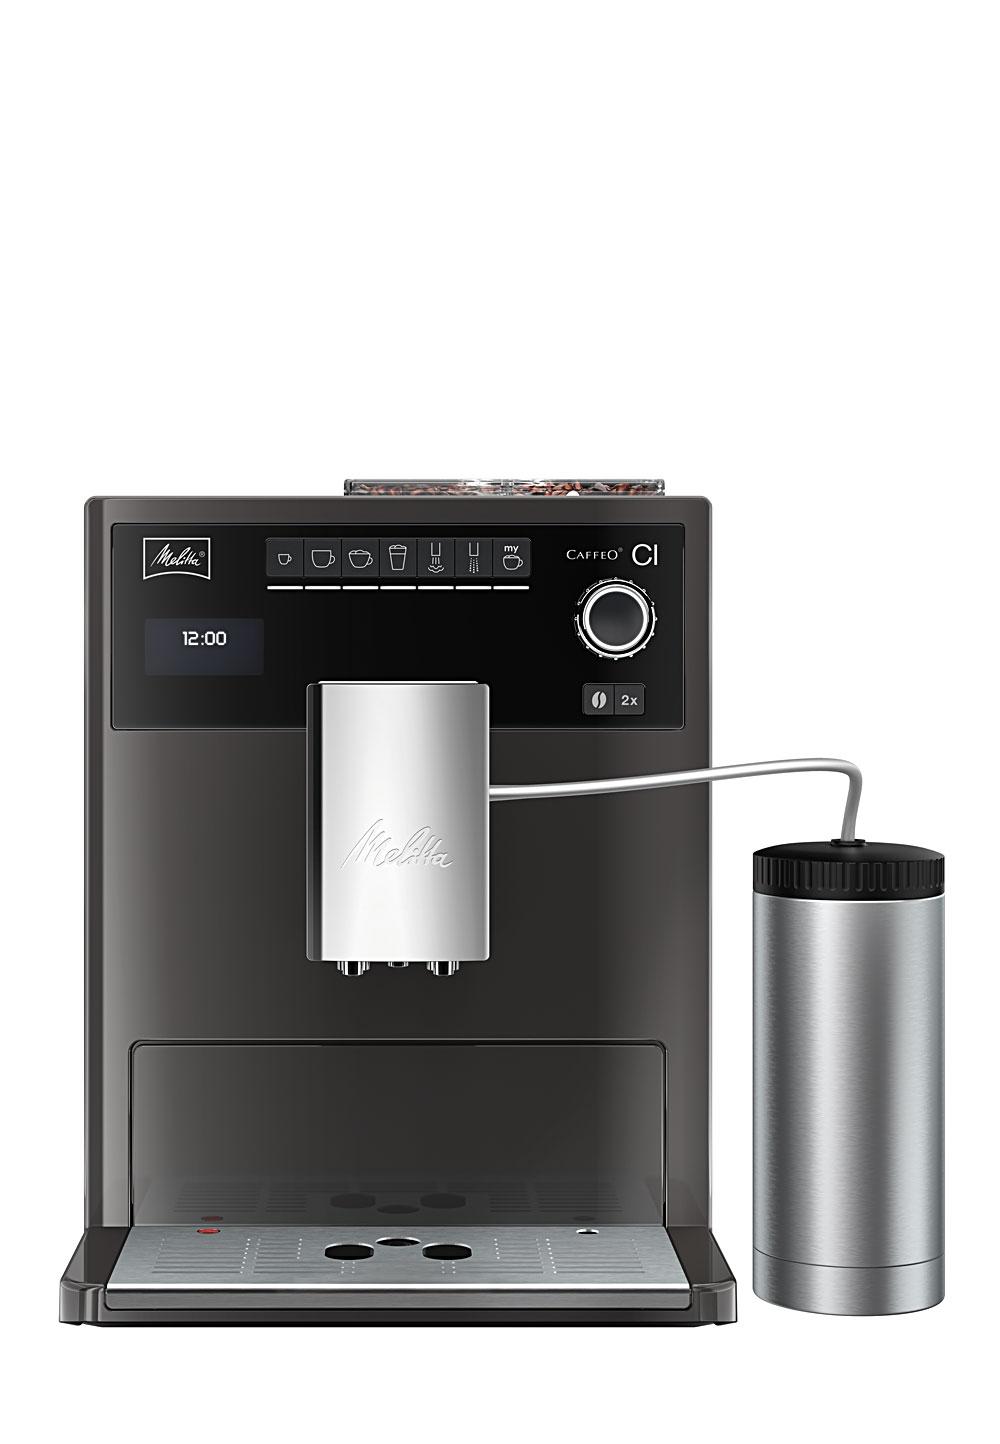 [brands4friends] MELITTA Kaffeevollautomat E970-205 Caffeo nur 459€ (mit Shoop)